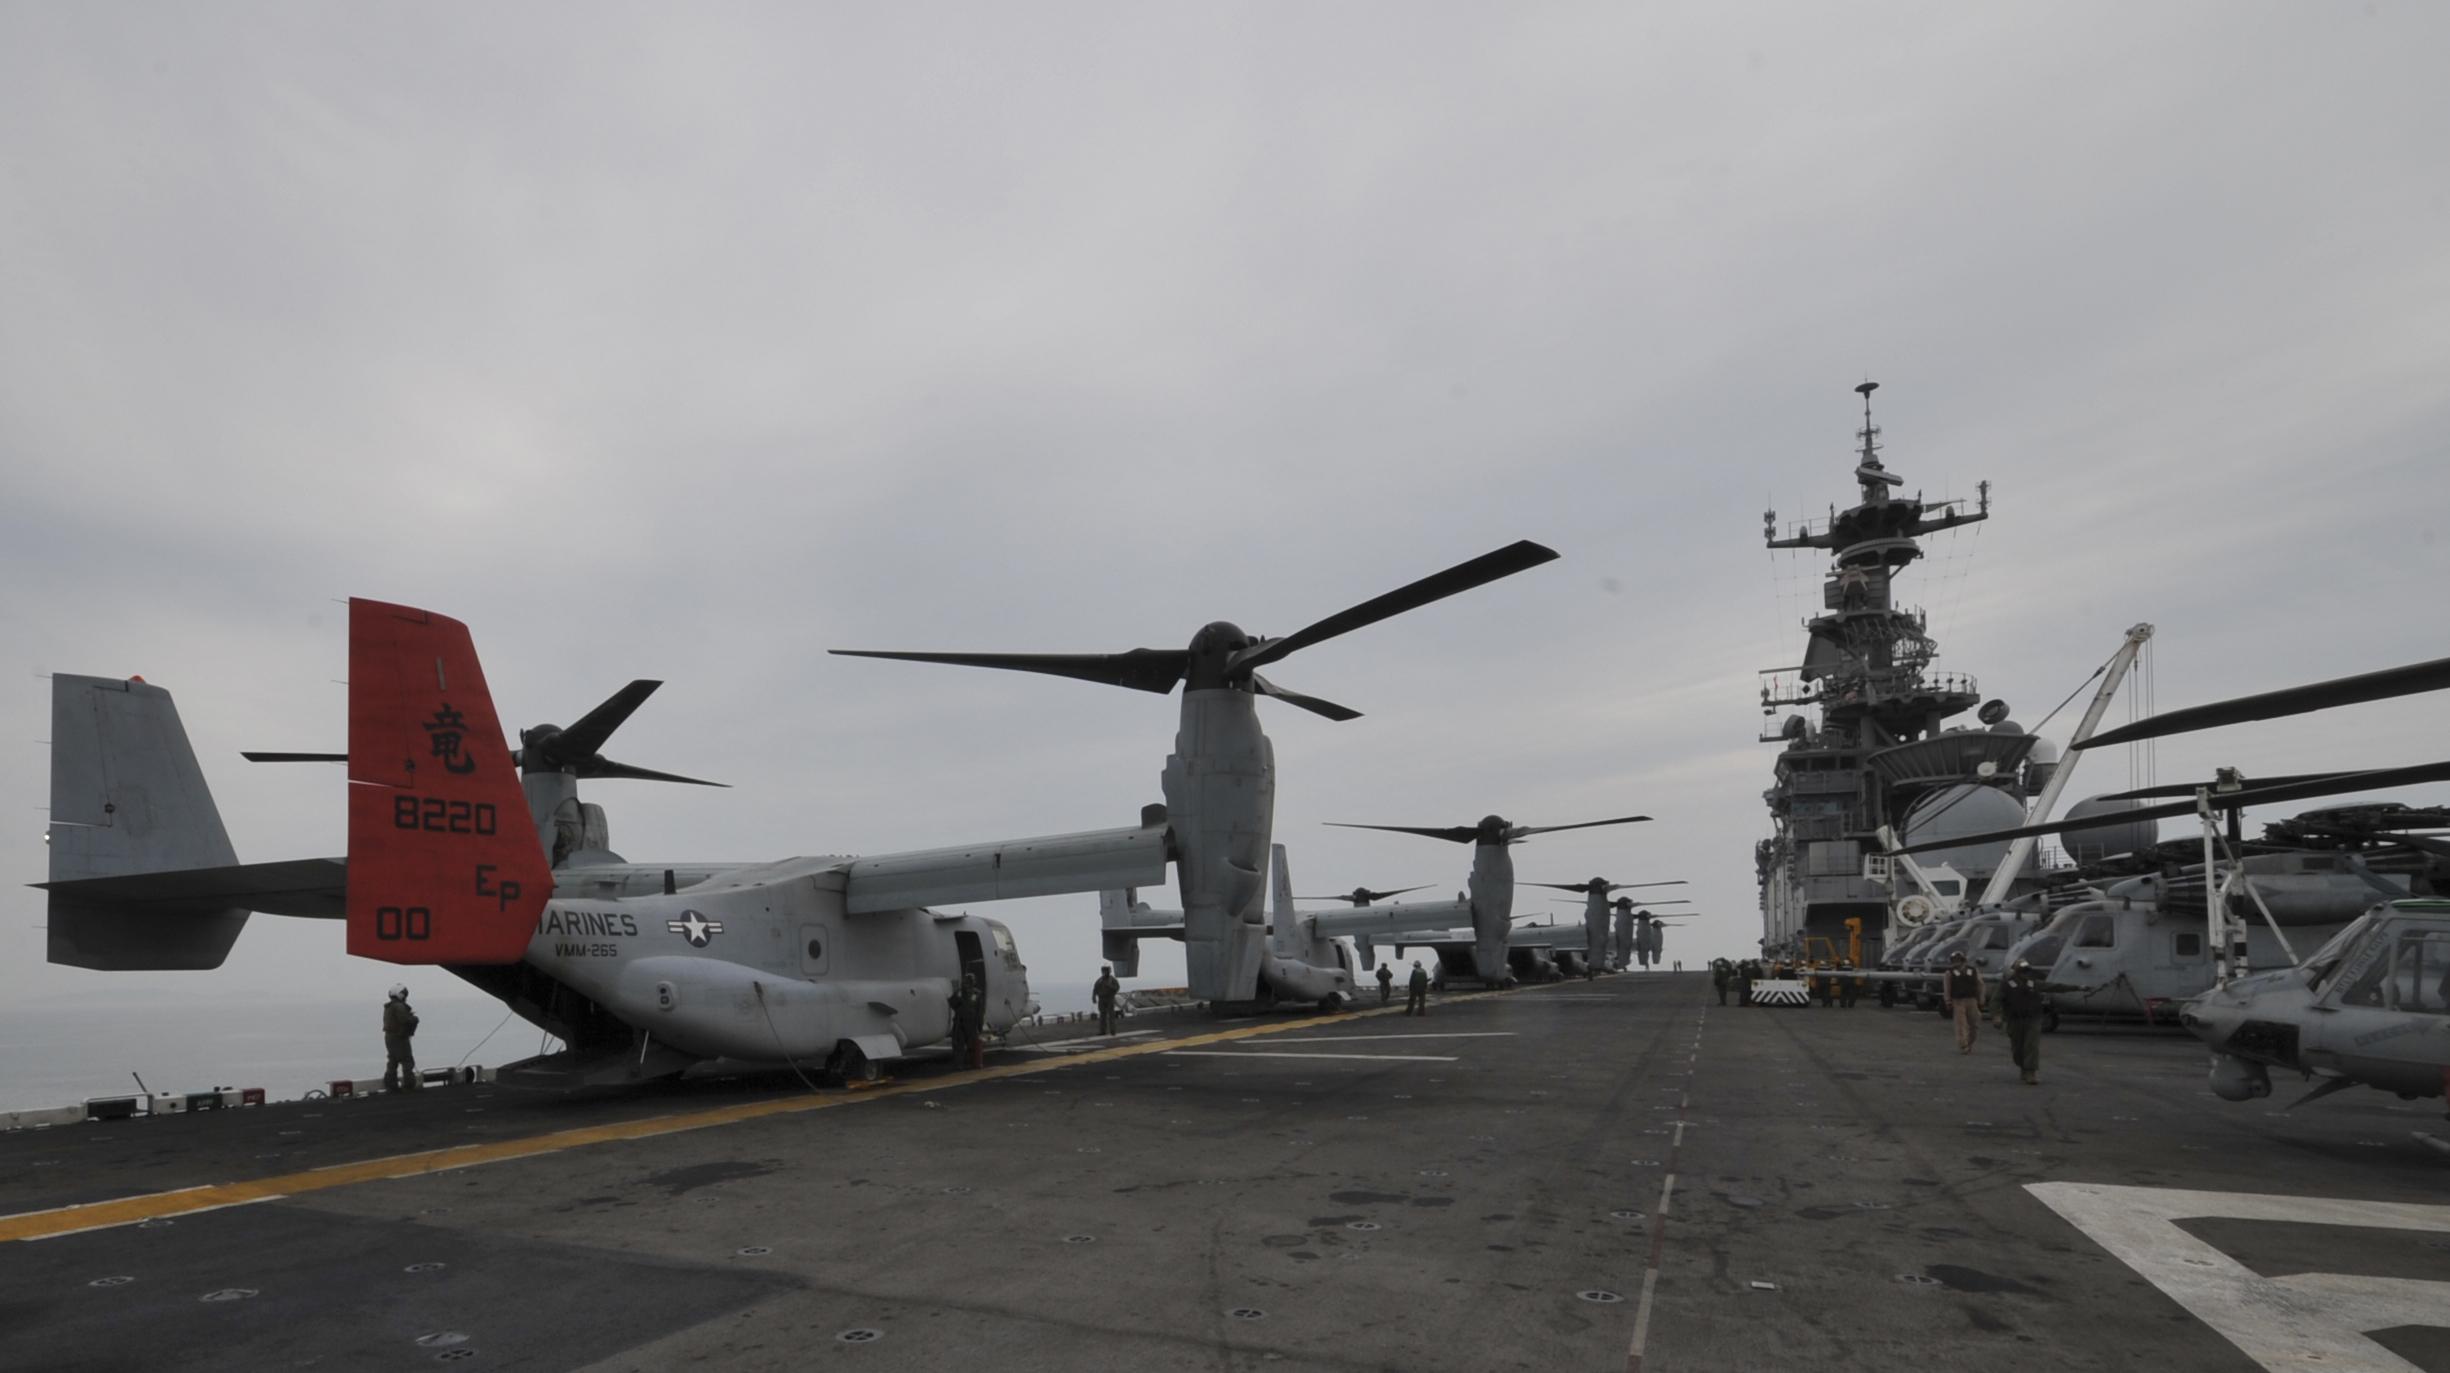 MV-22 on the deck of USS Bonhomme Richard (LHD-6) on April 16, 2014. US Navy Photo